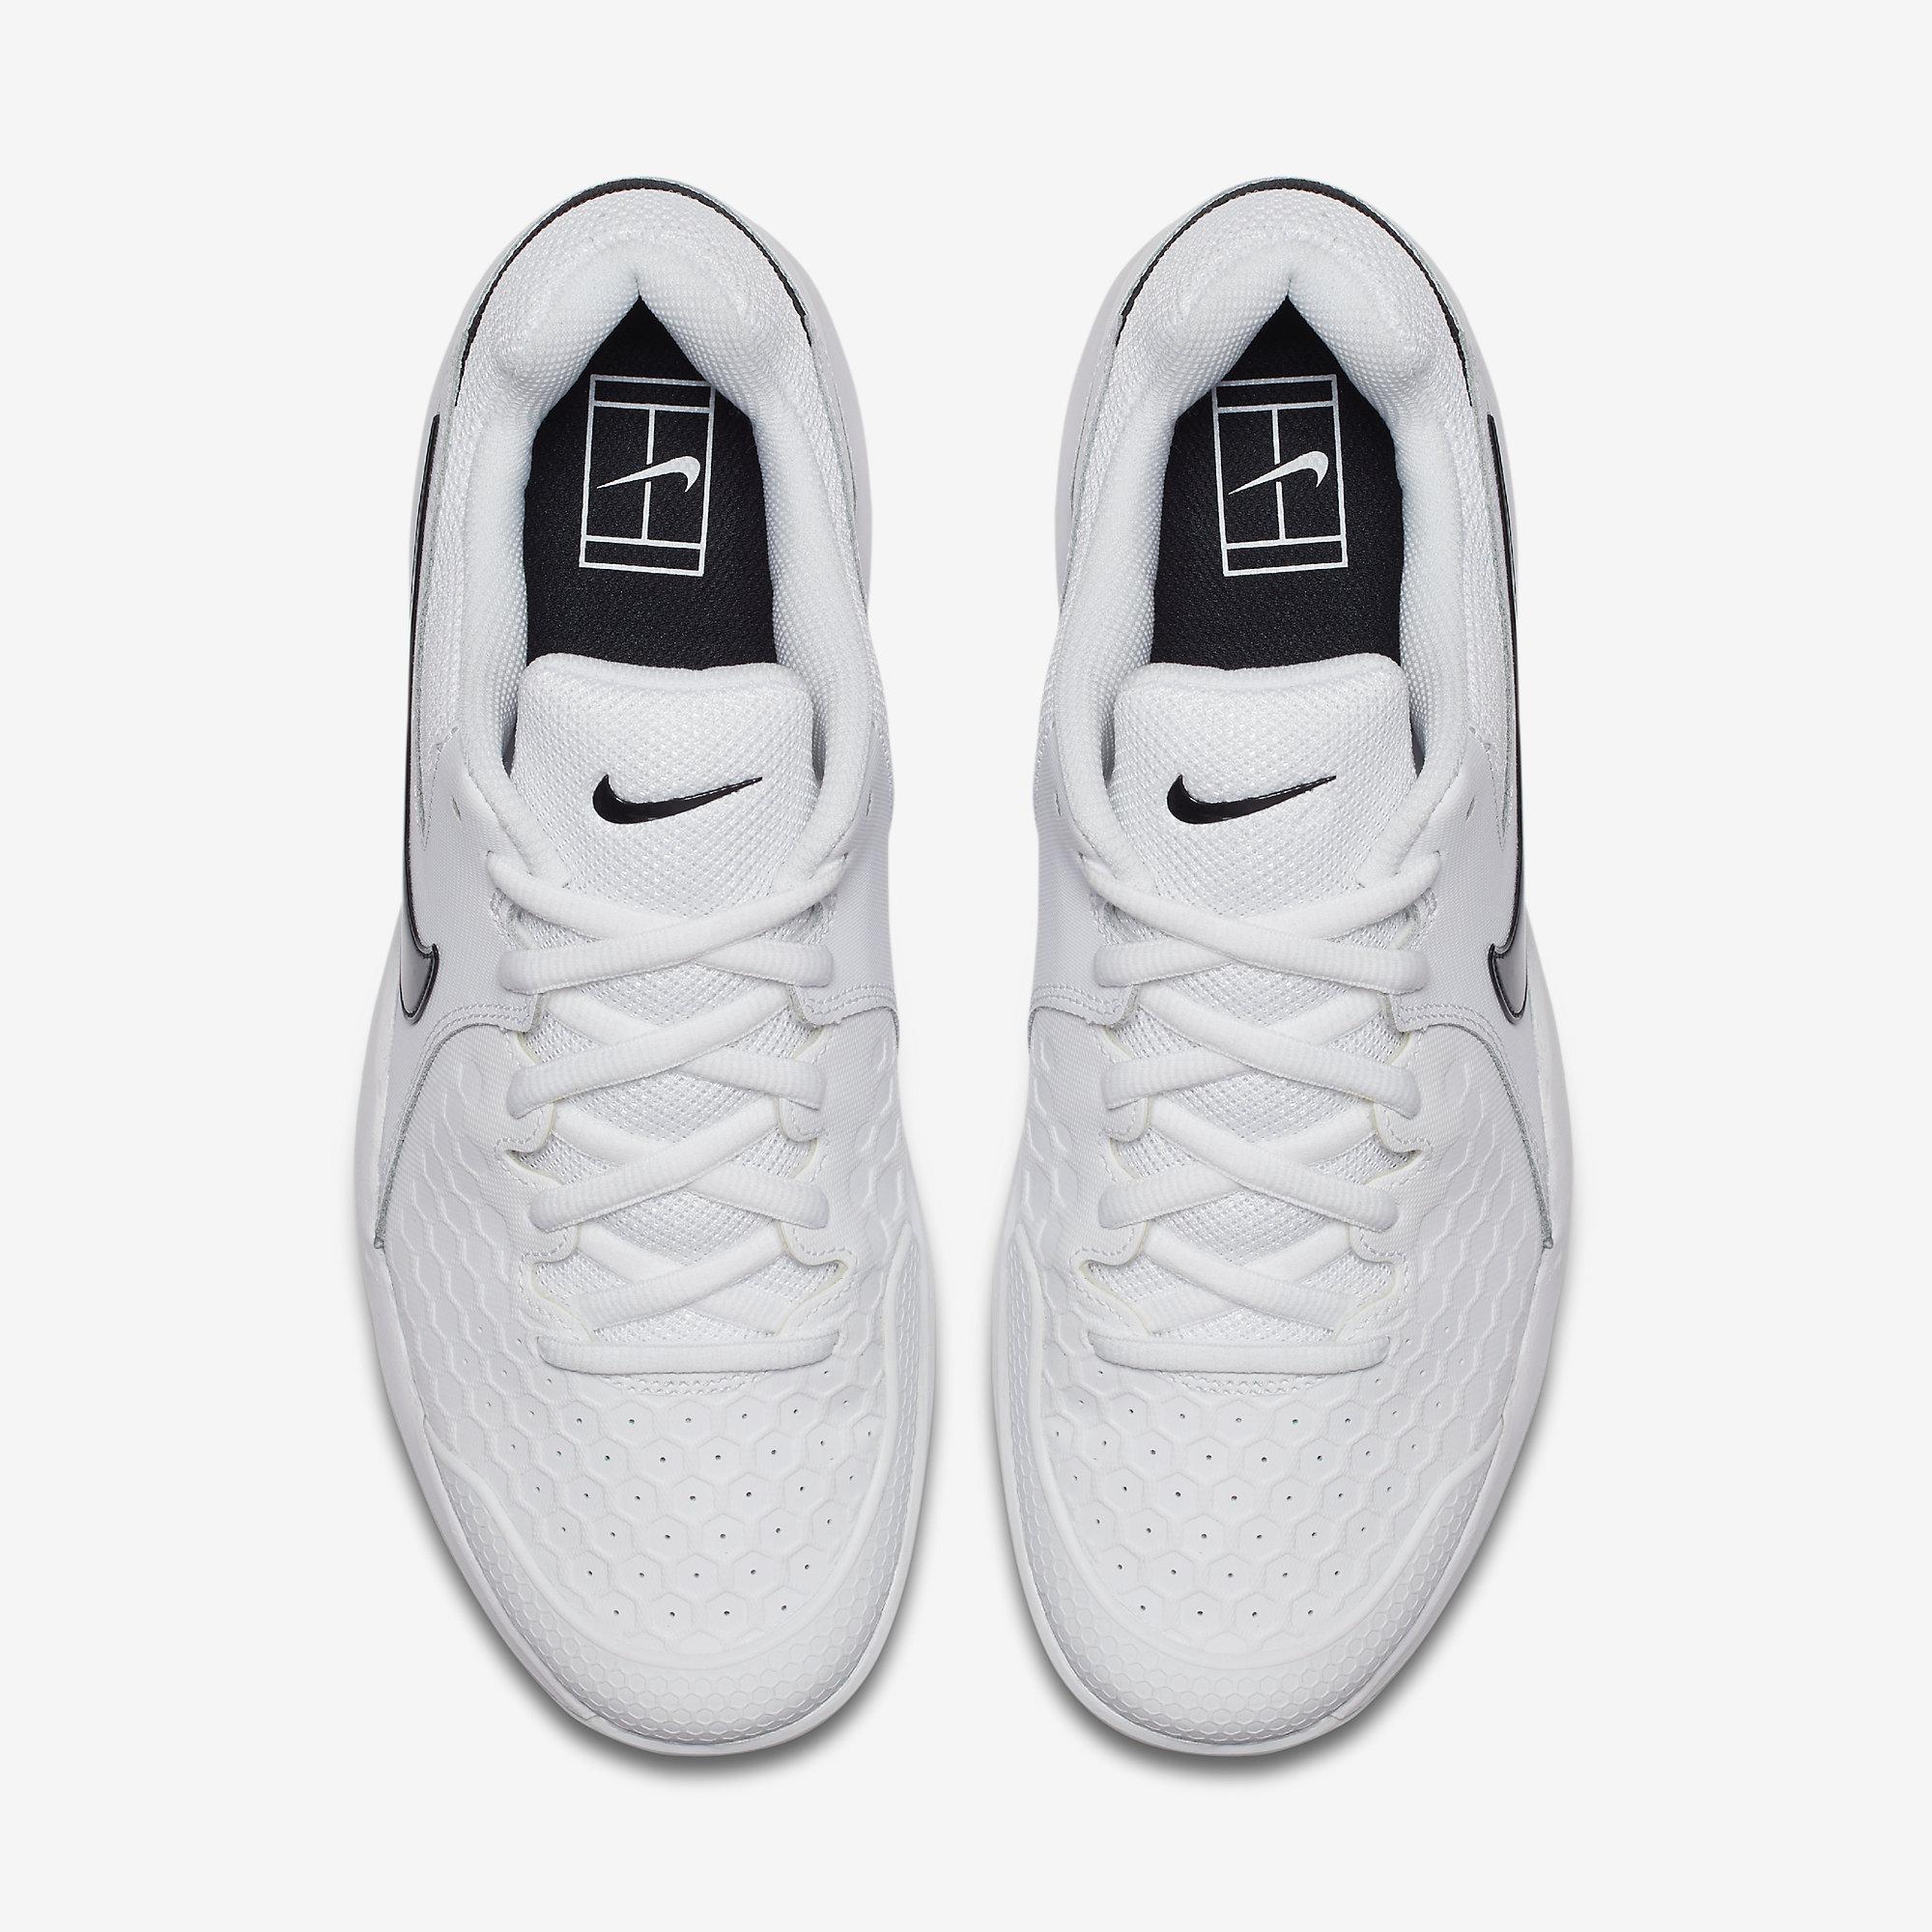 21e42d7bd4 Nike Mens Air Zoom Resistance Tennis Shoes - White/Black ...